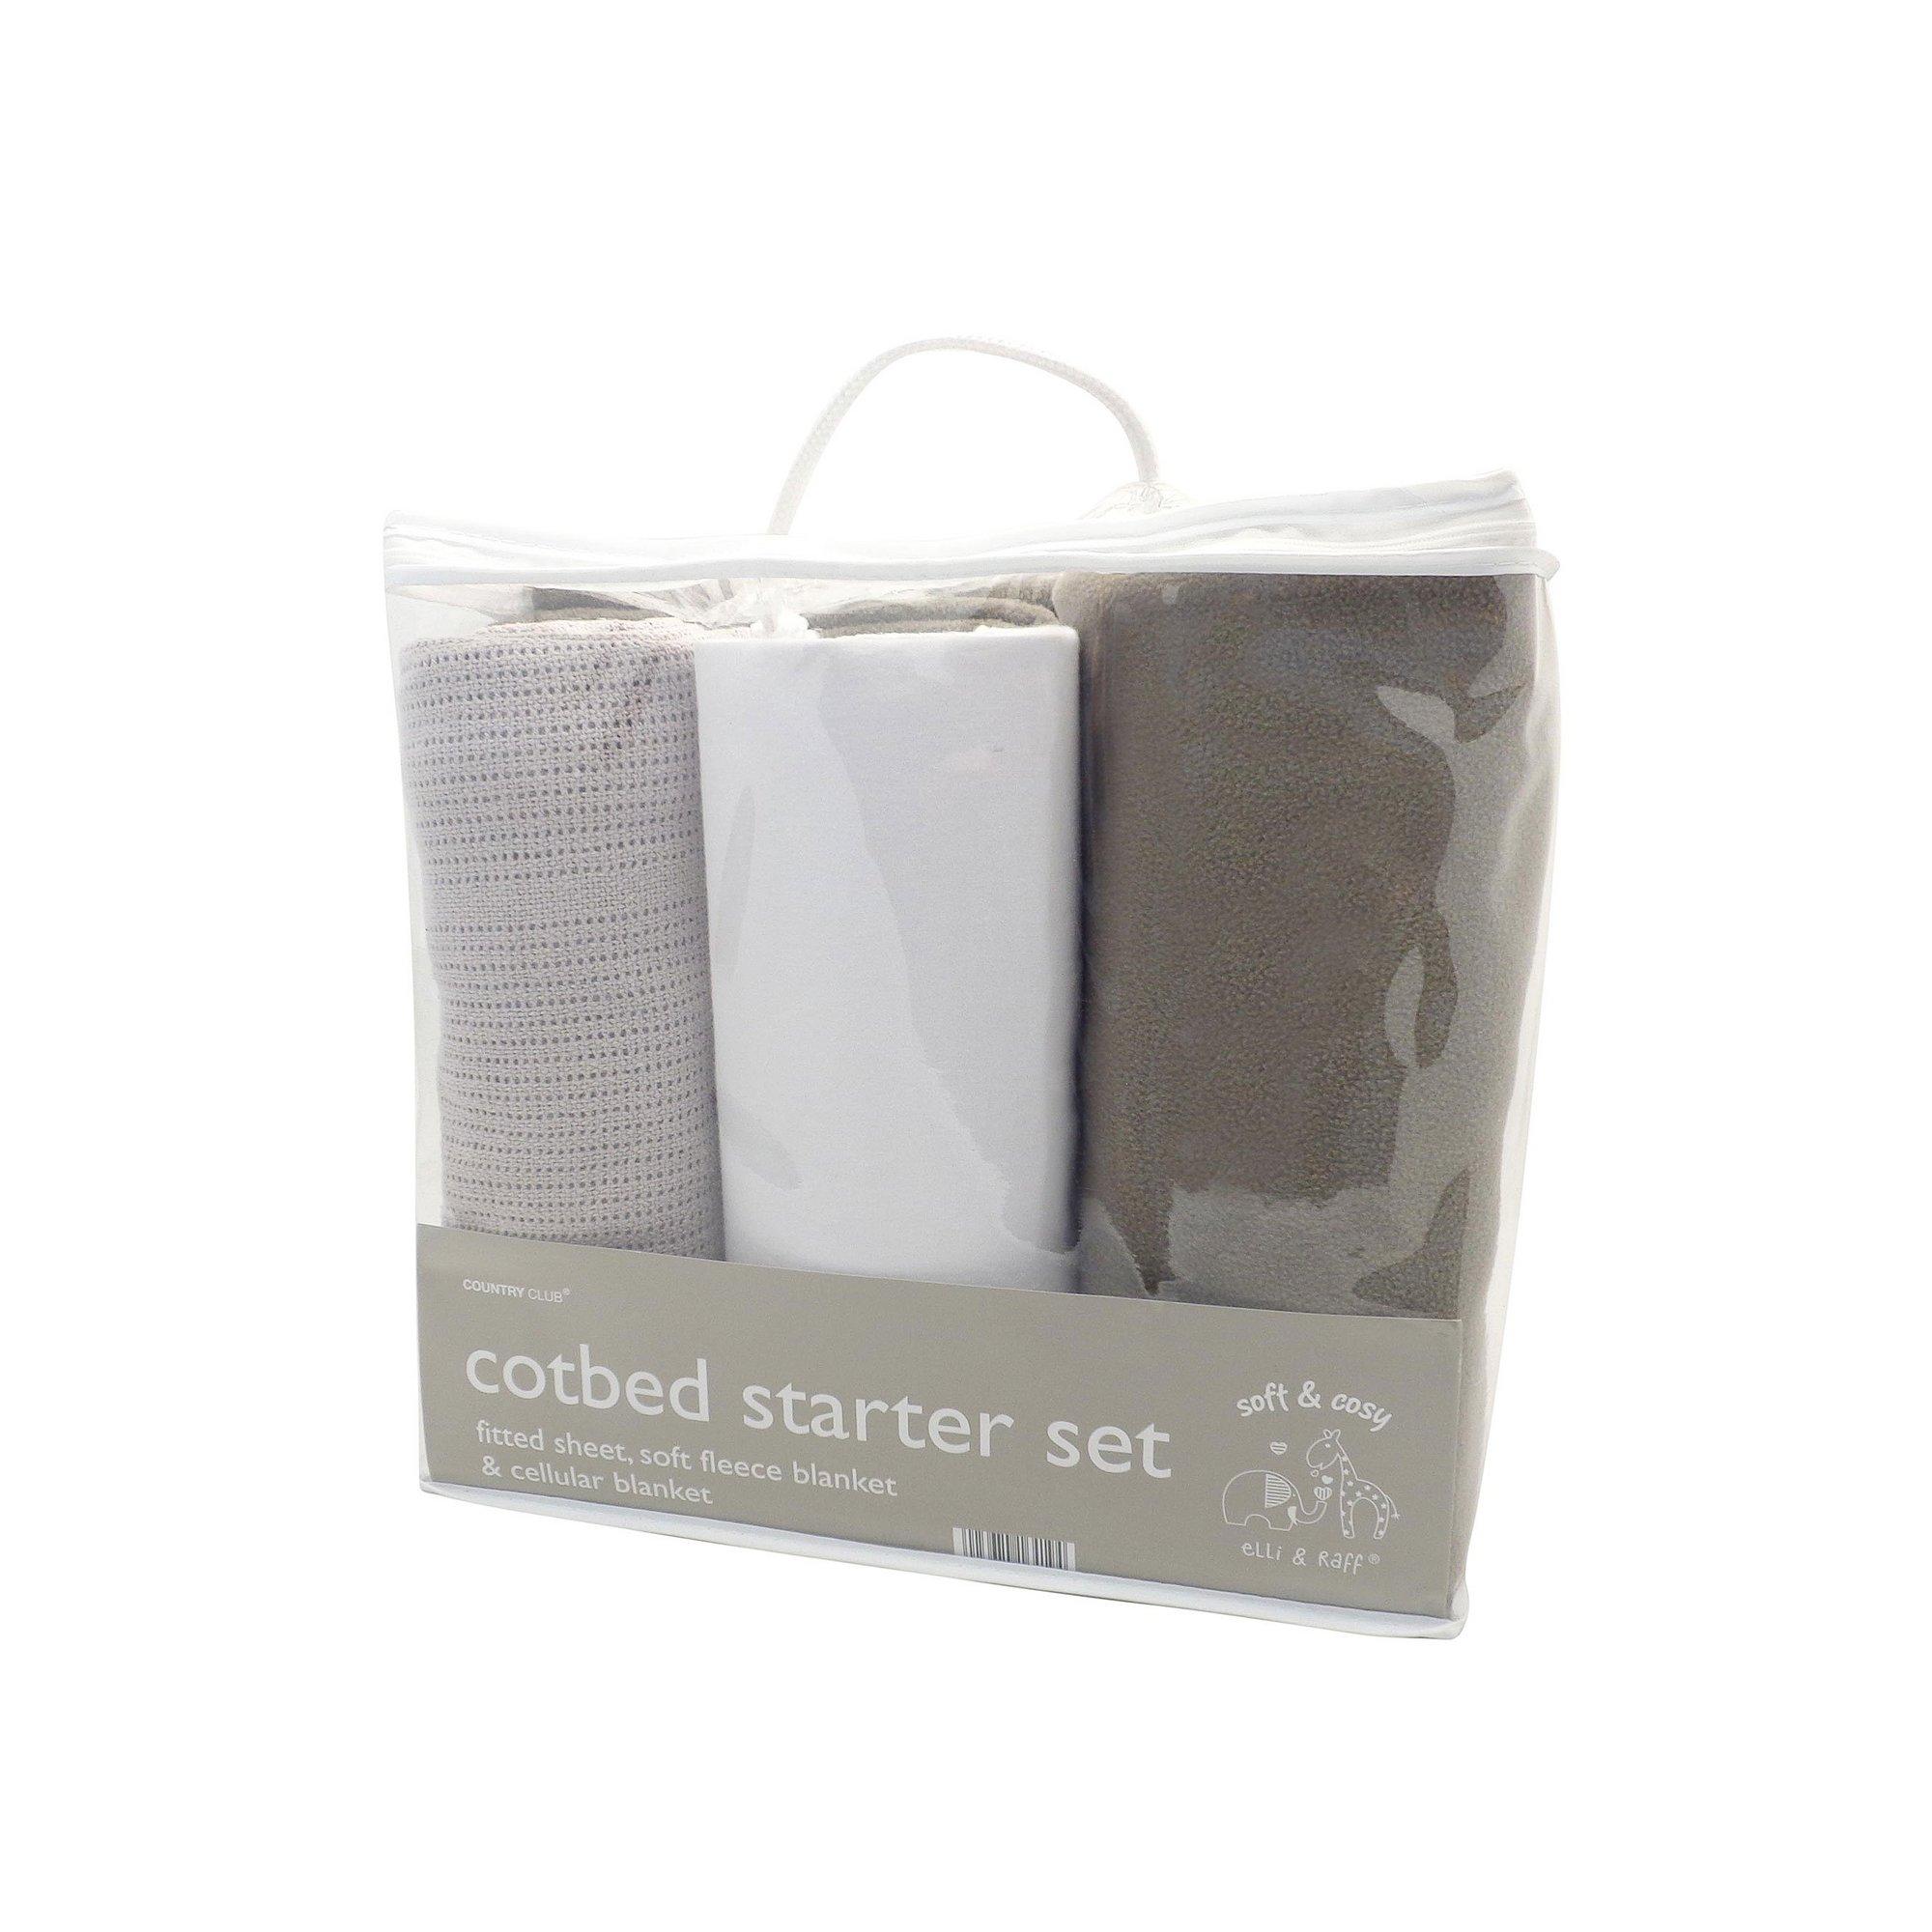 Image of 3 Piece Cot Bed Grey Starter Set